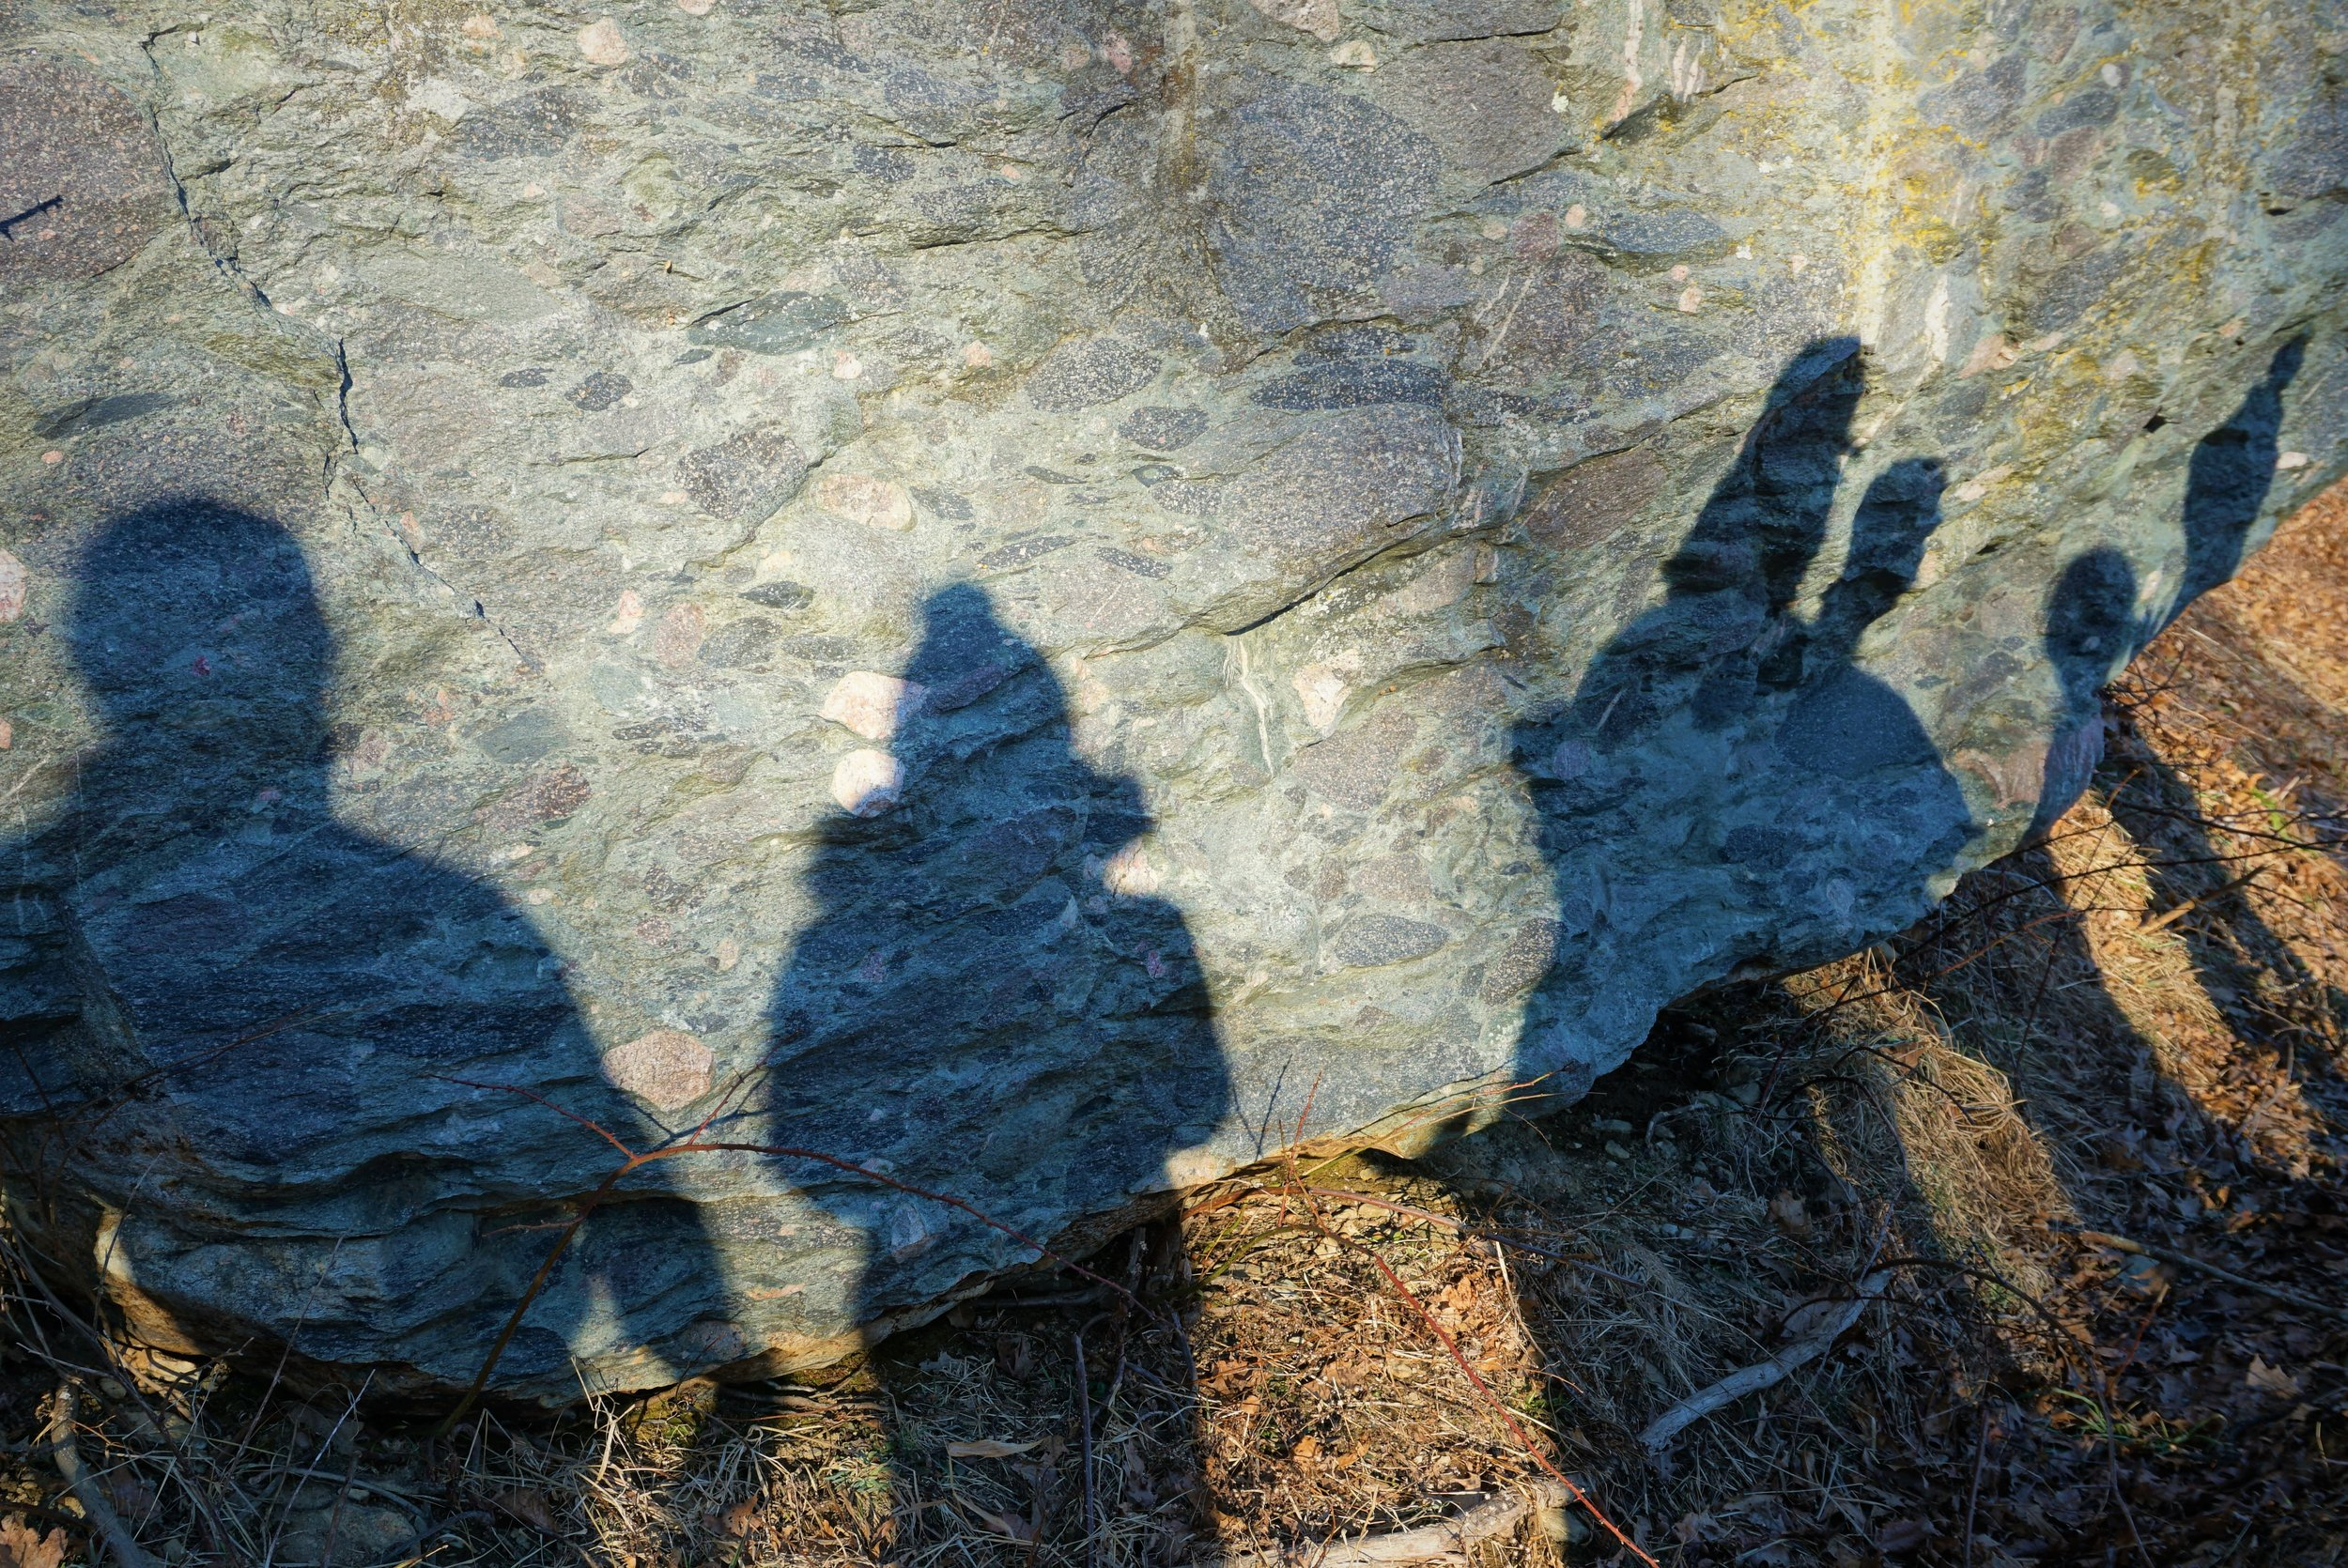 Participants admiring a road cut of boulder conglomerate.